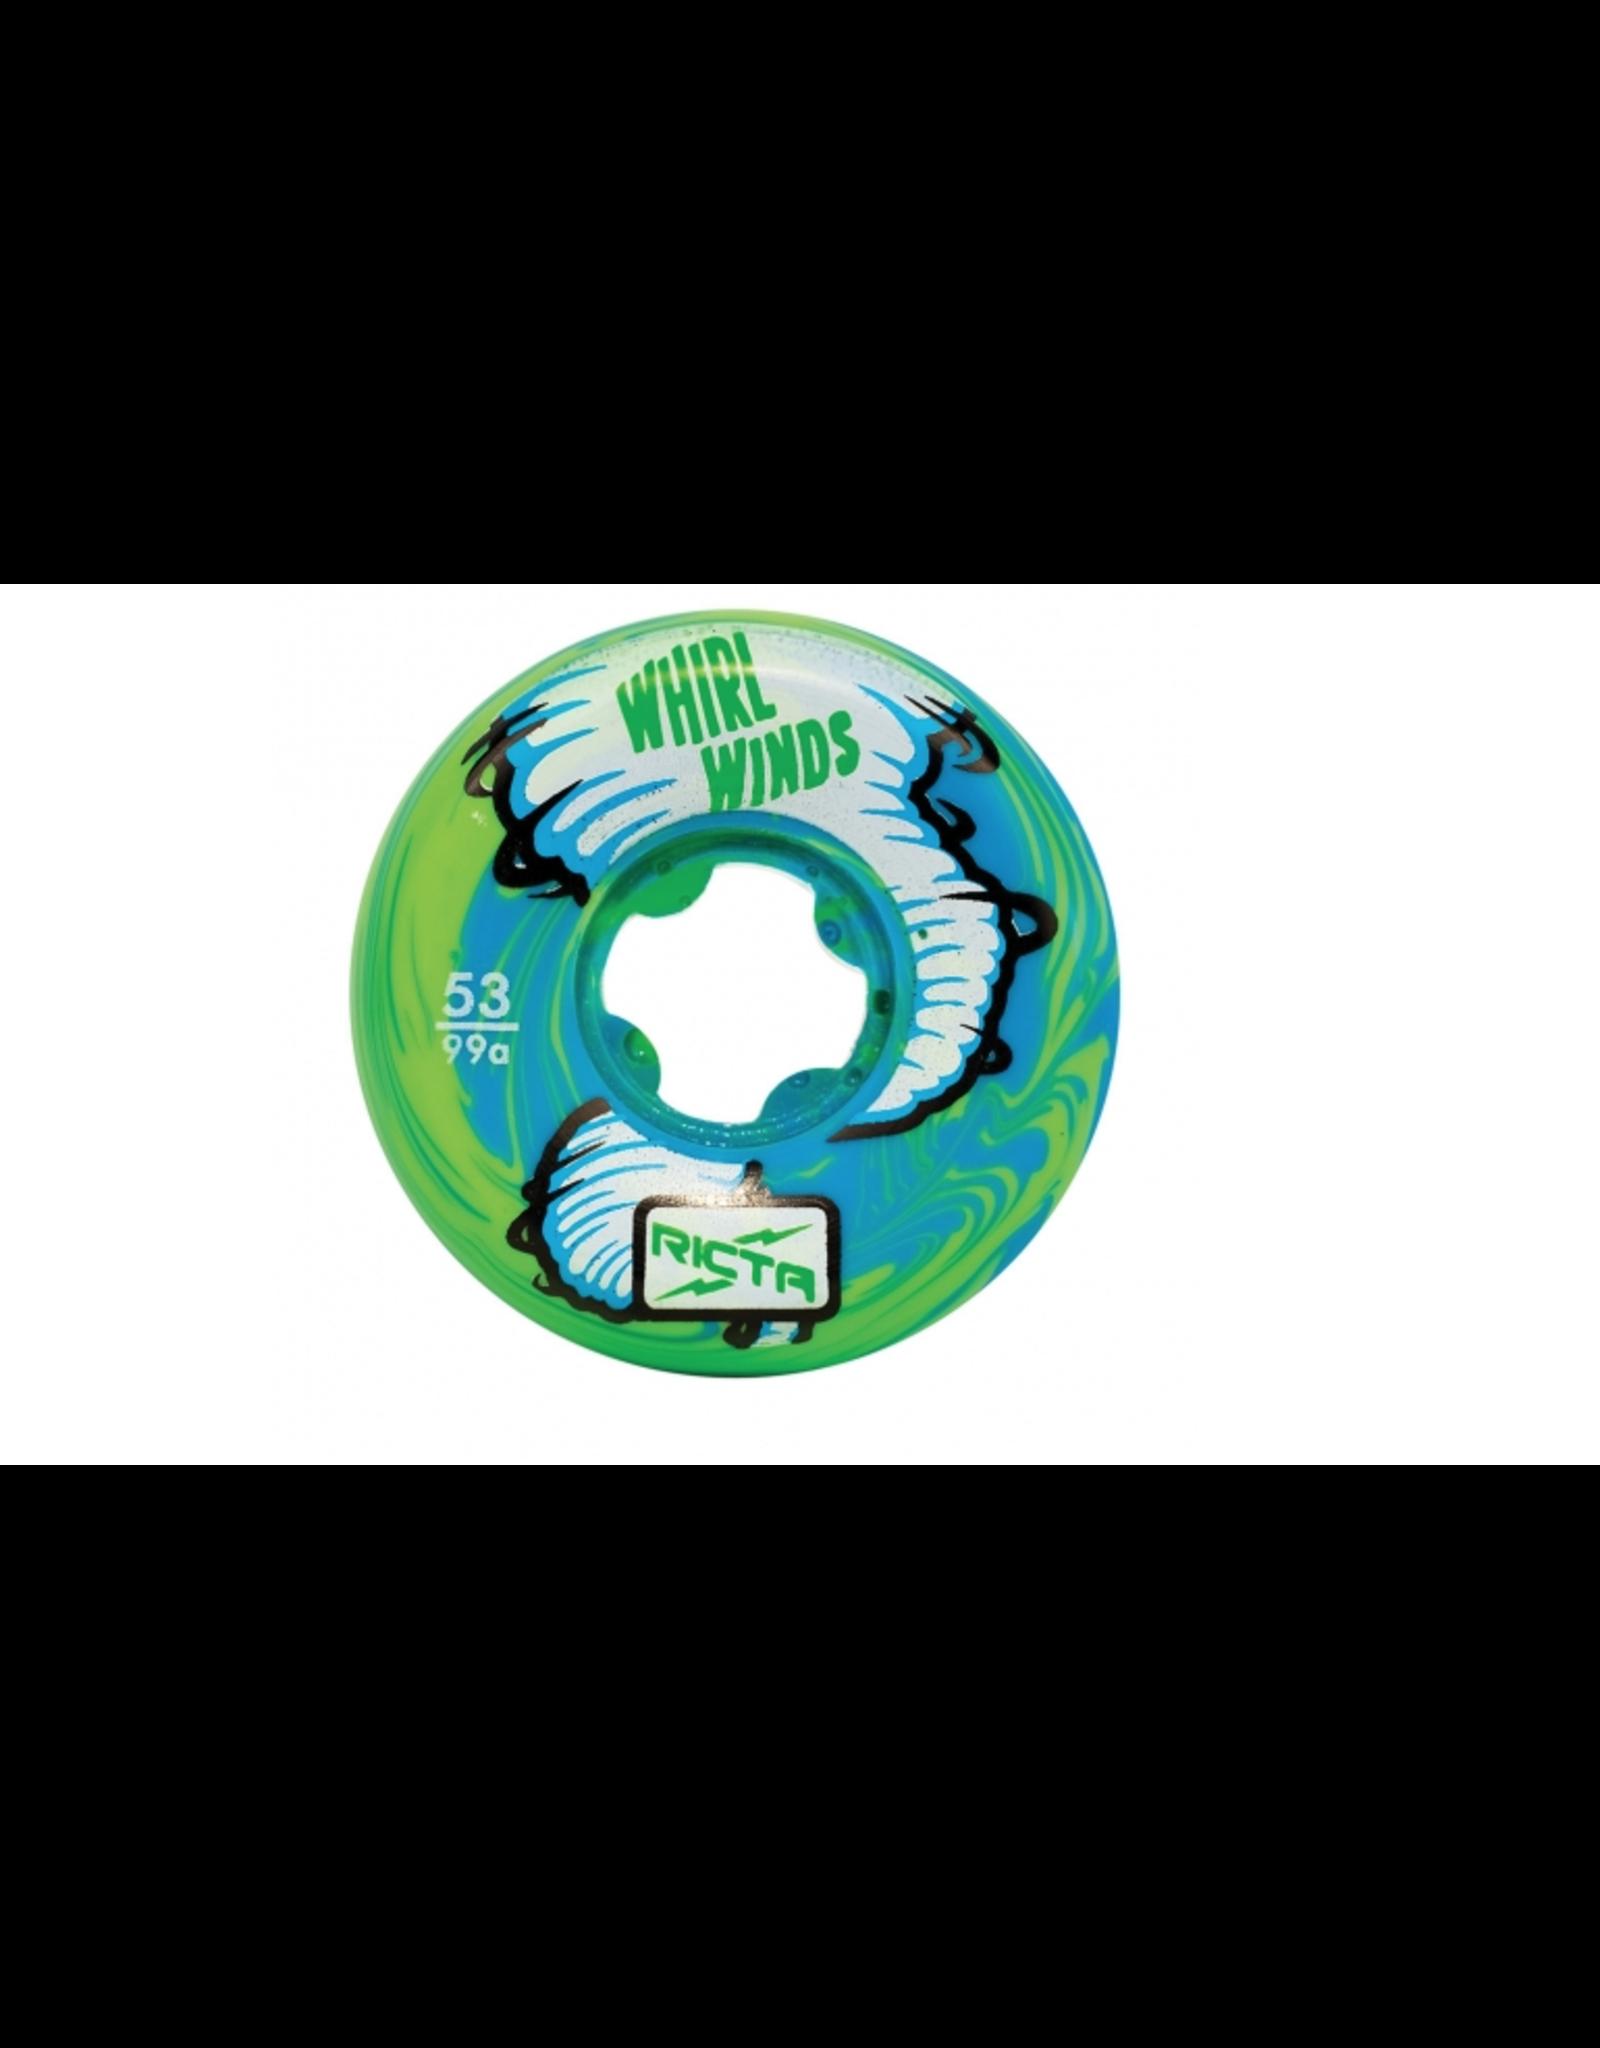 RICTA 53mm Whirlwinds Blue Green Swirl 99a Ricta Skateboard Wheels